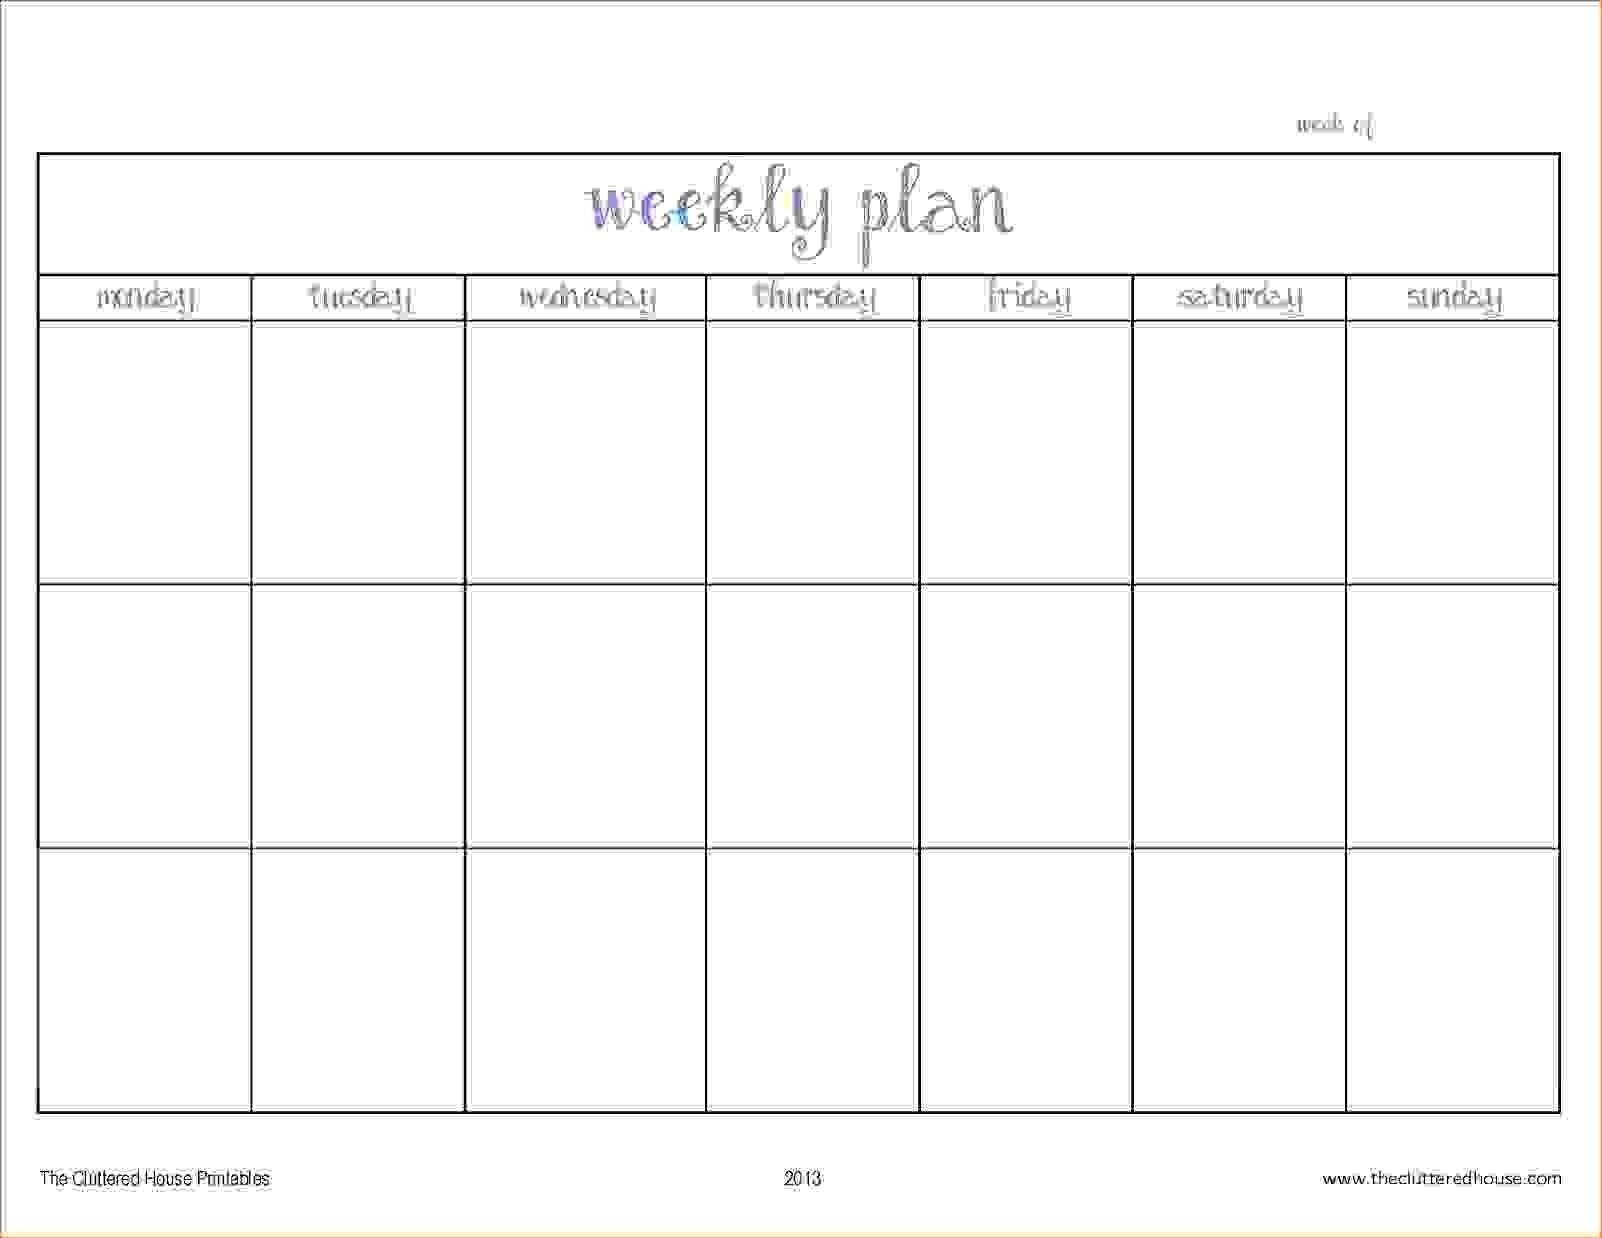 Blank Two Week Schedule Template Calendar | Smorad pertaining to Blank Two Week Schedule Template